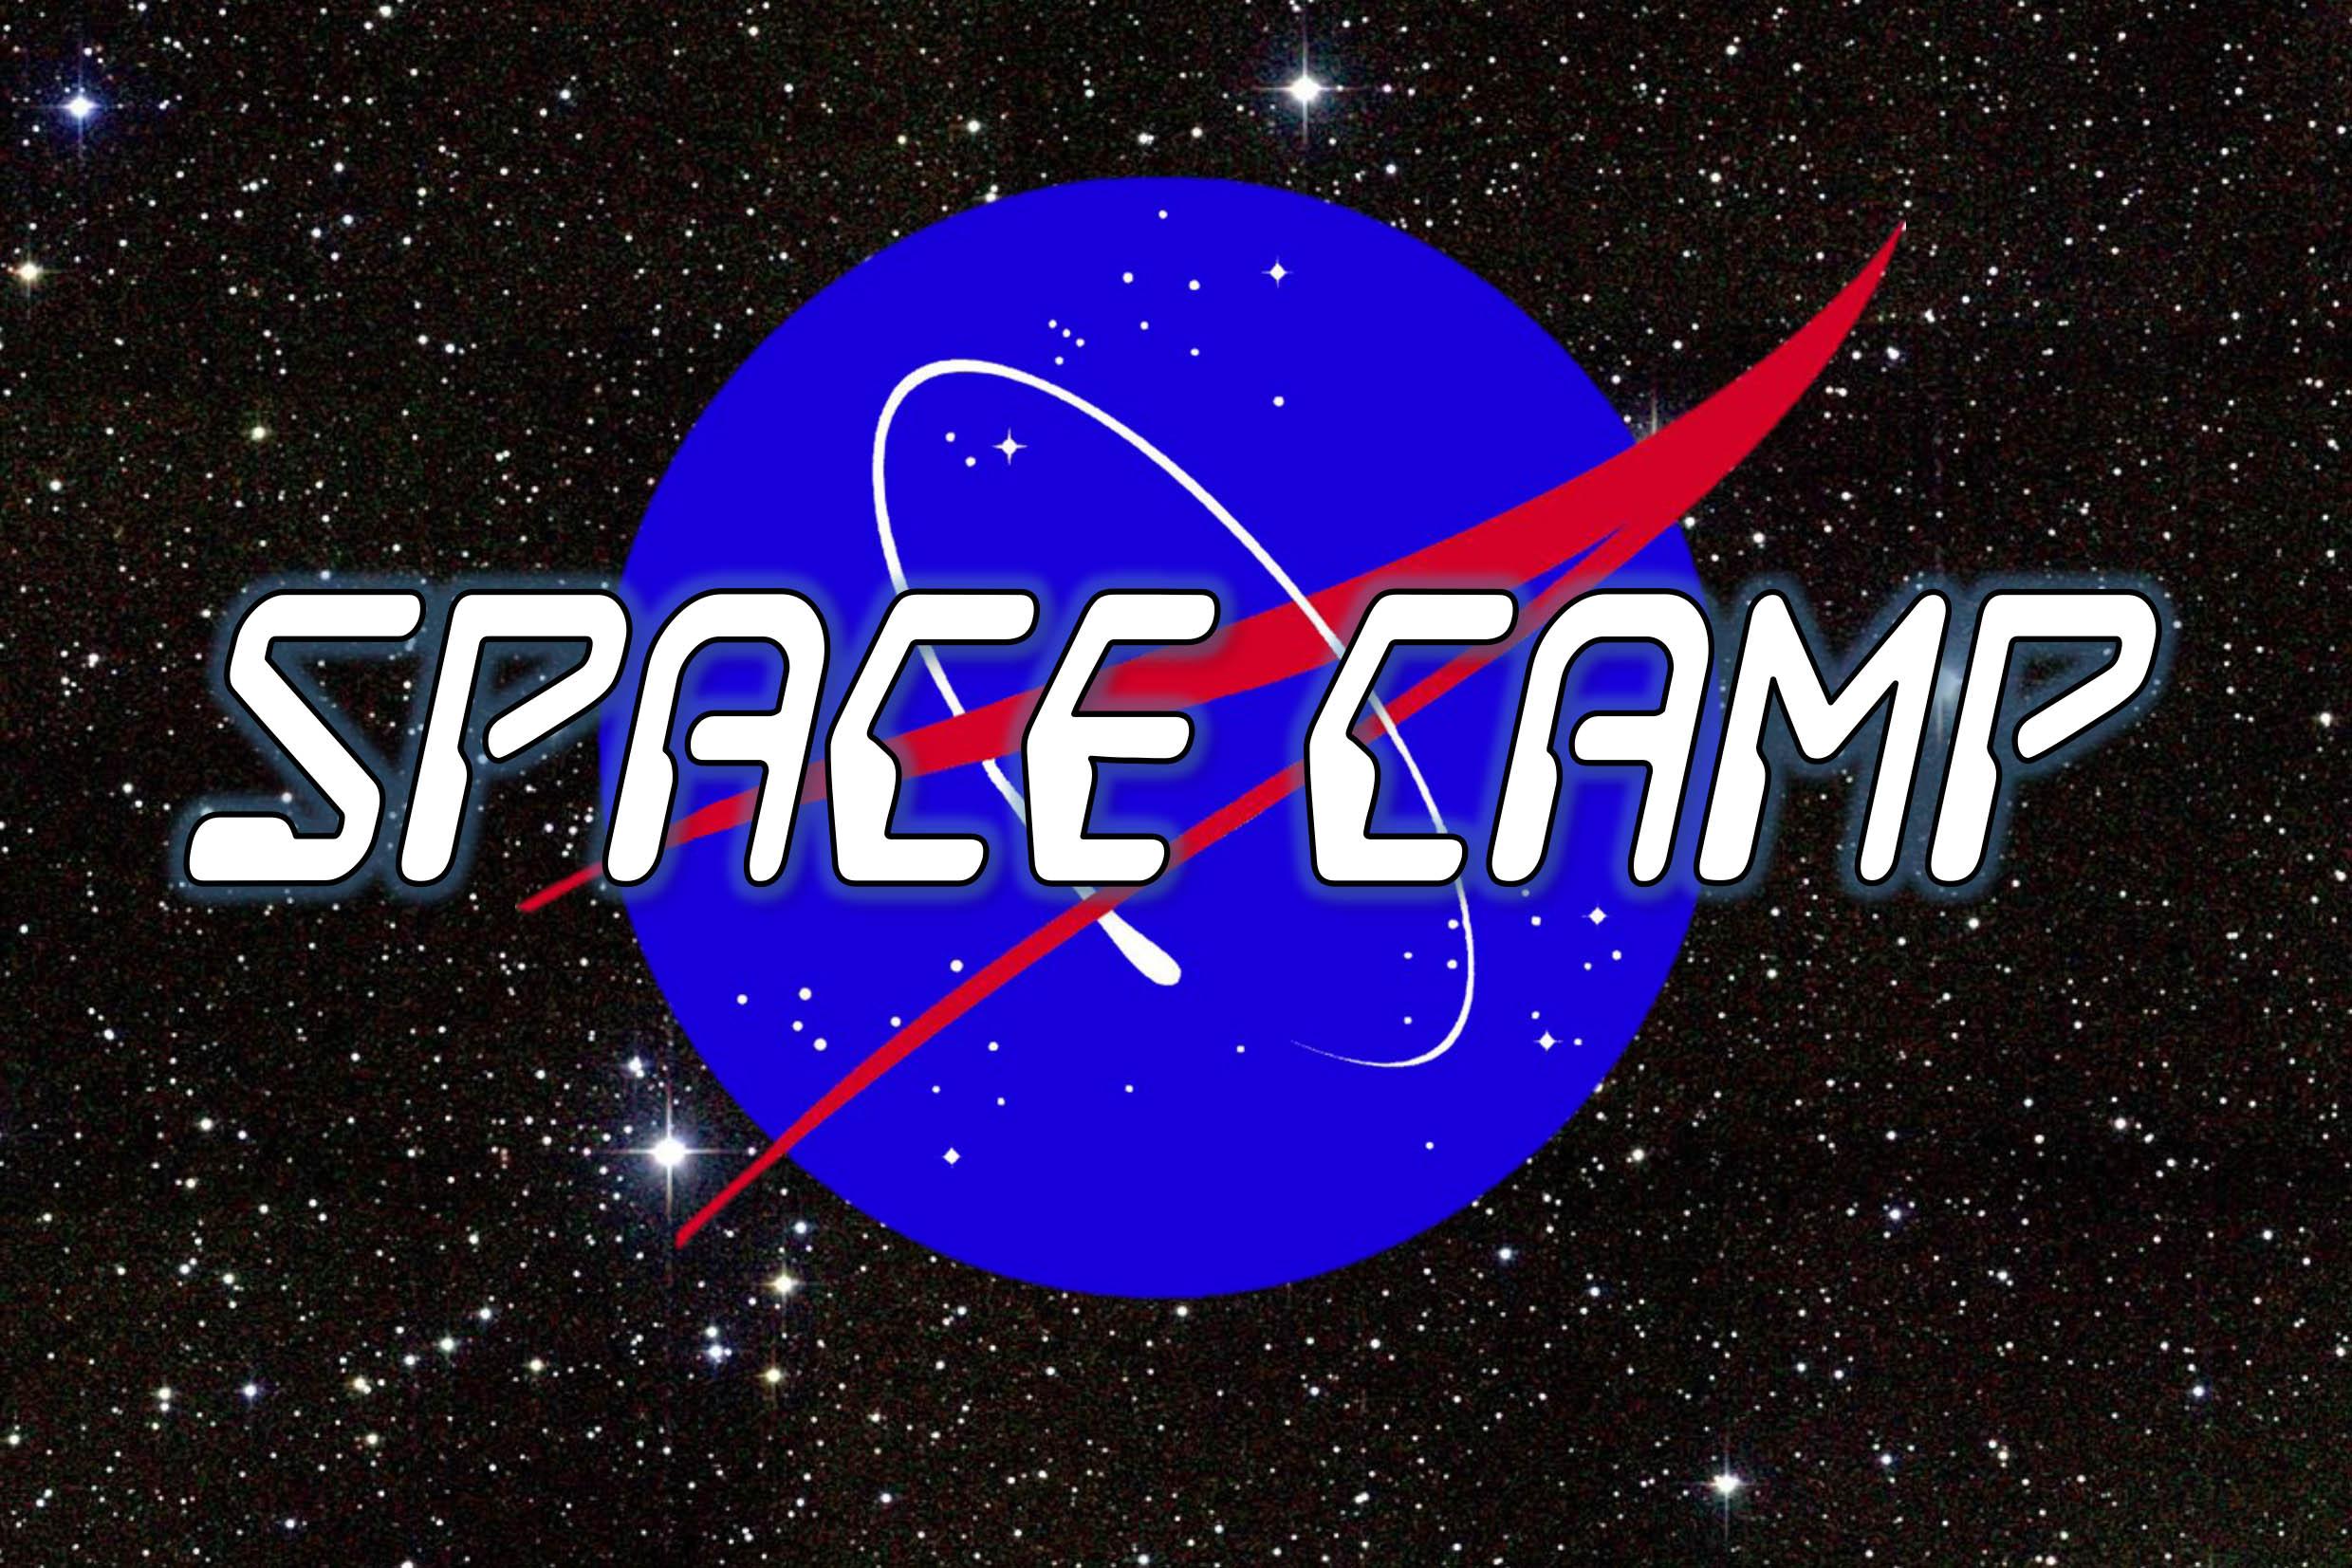 spacecampflyer1.jpg